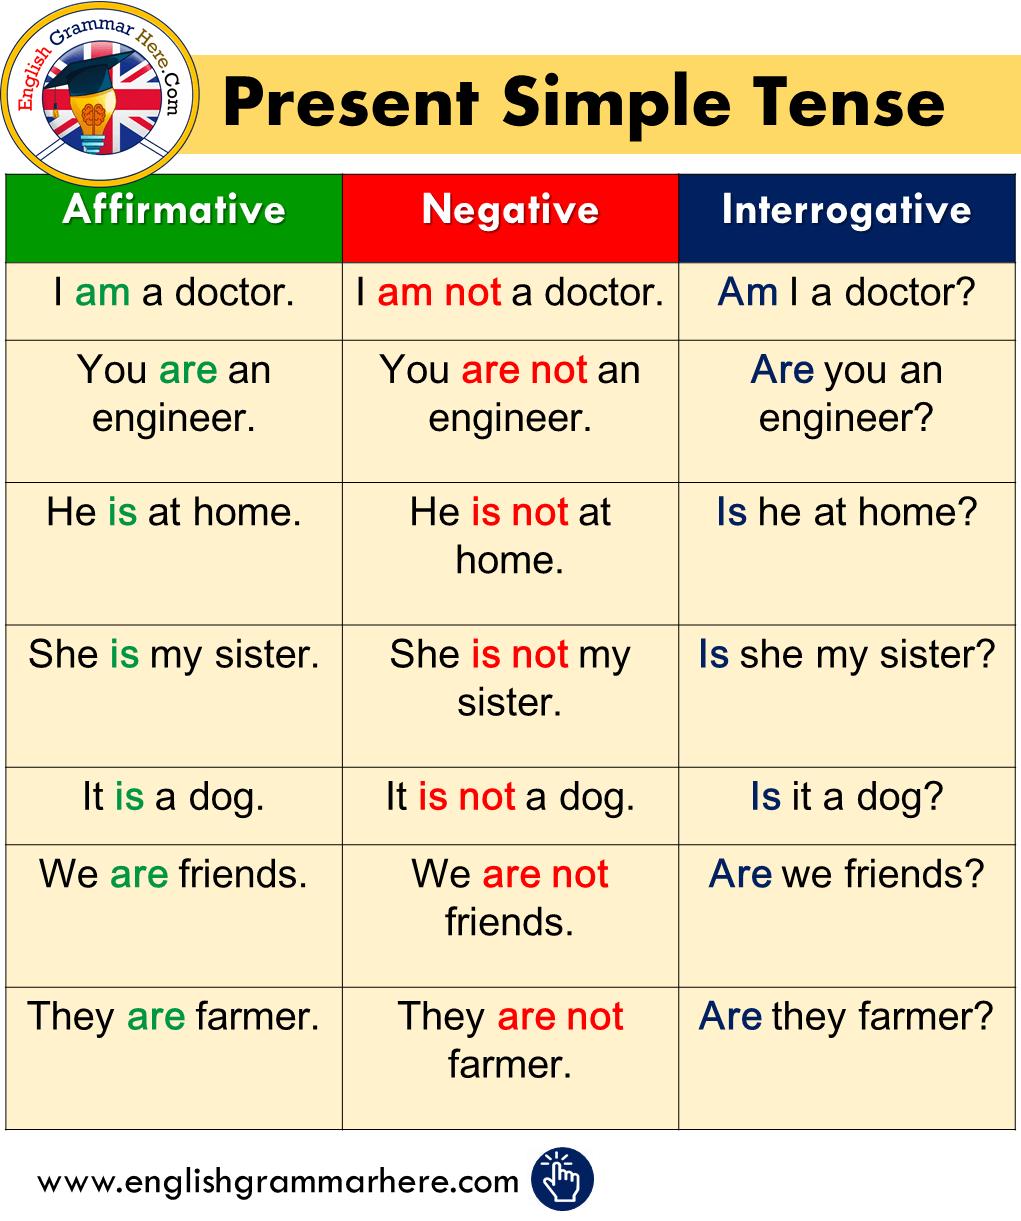 Present Simple Tense Affirmative Negative Interrogative English Grammar English Vocabulary Words English Words [ 1221 x 1021 Pixel ]